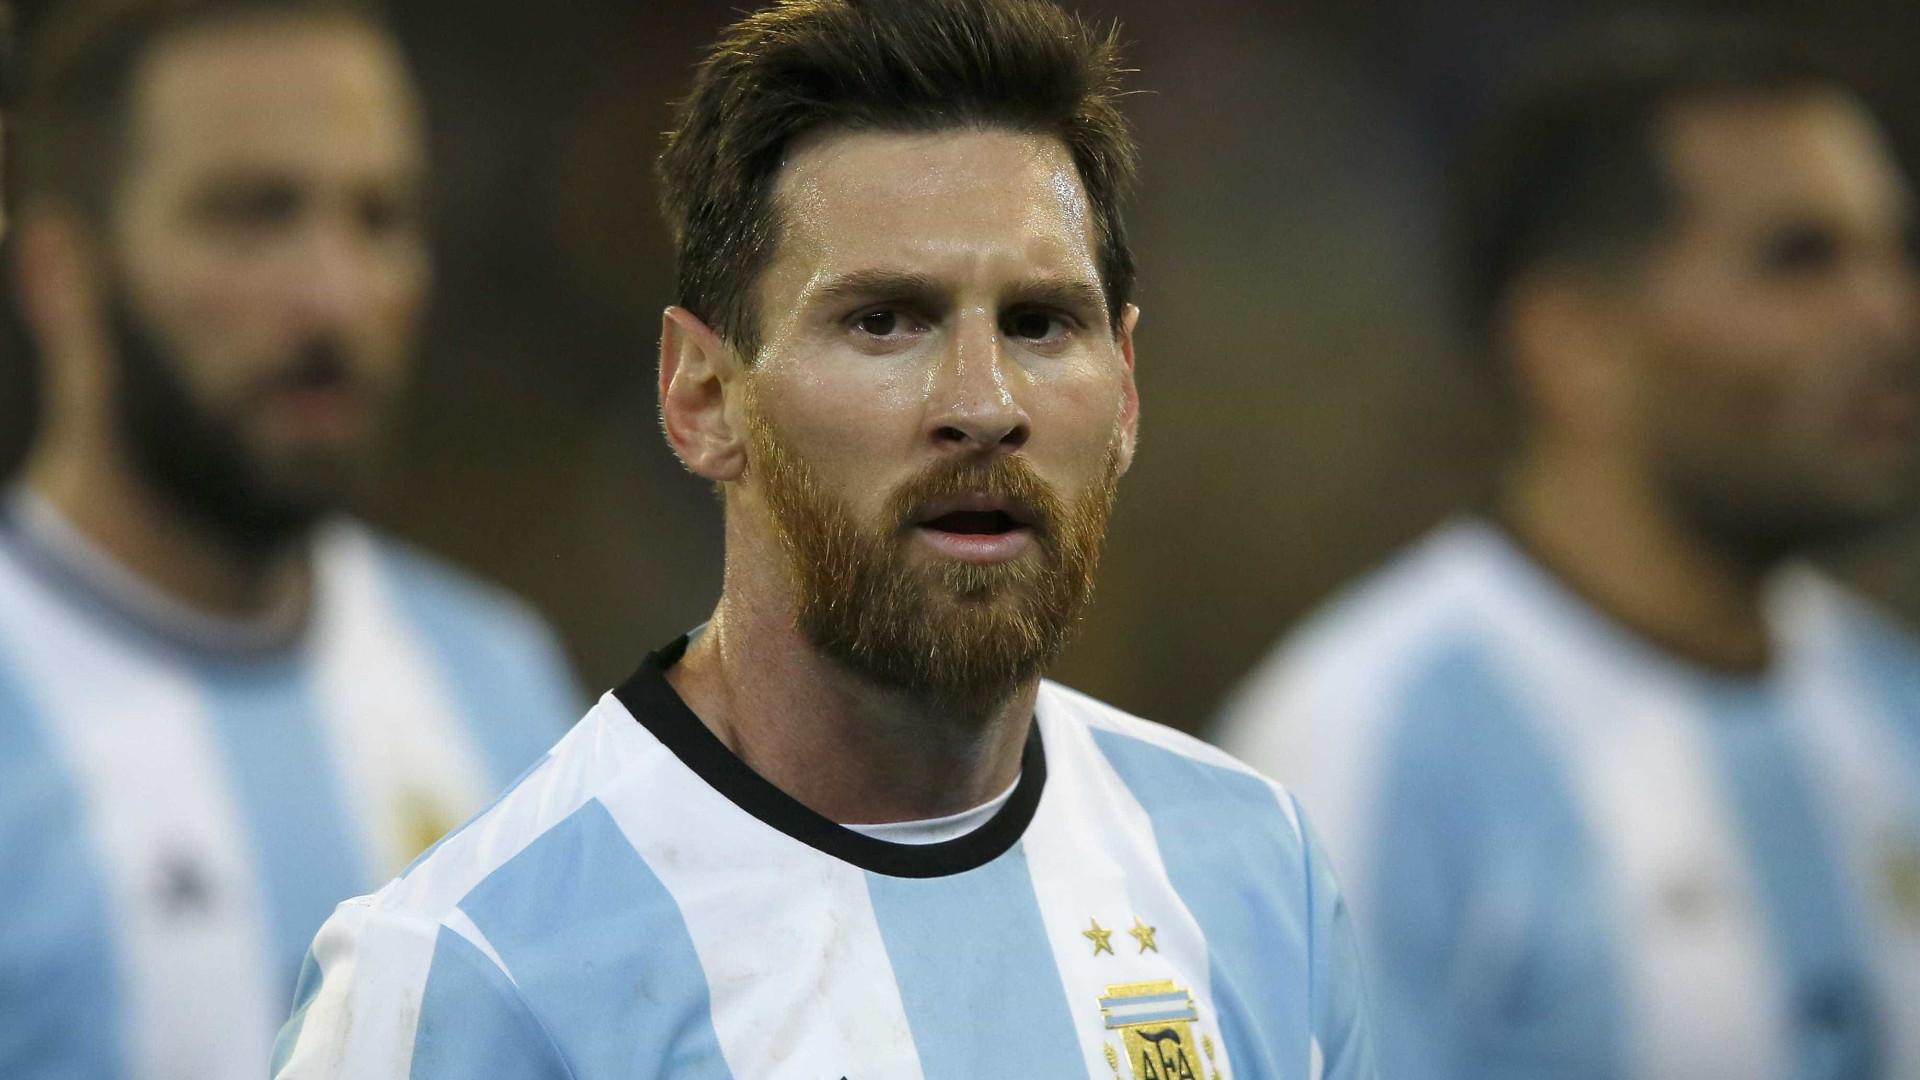 Messi promete caminhar 50km se a Argentina ganhar a Copa da Rússia